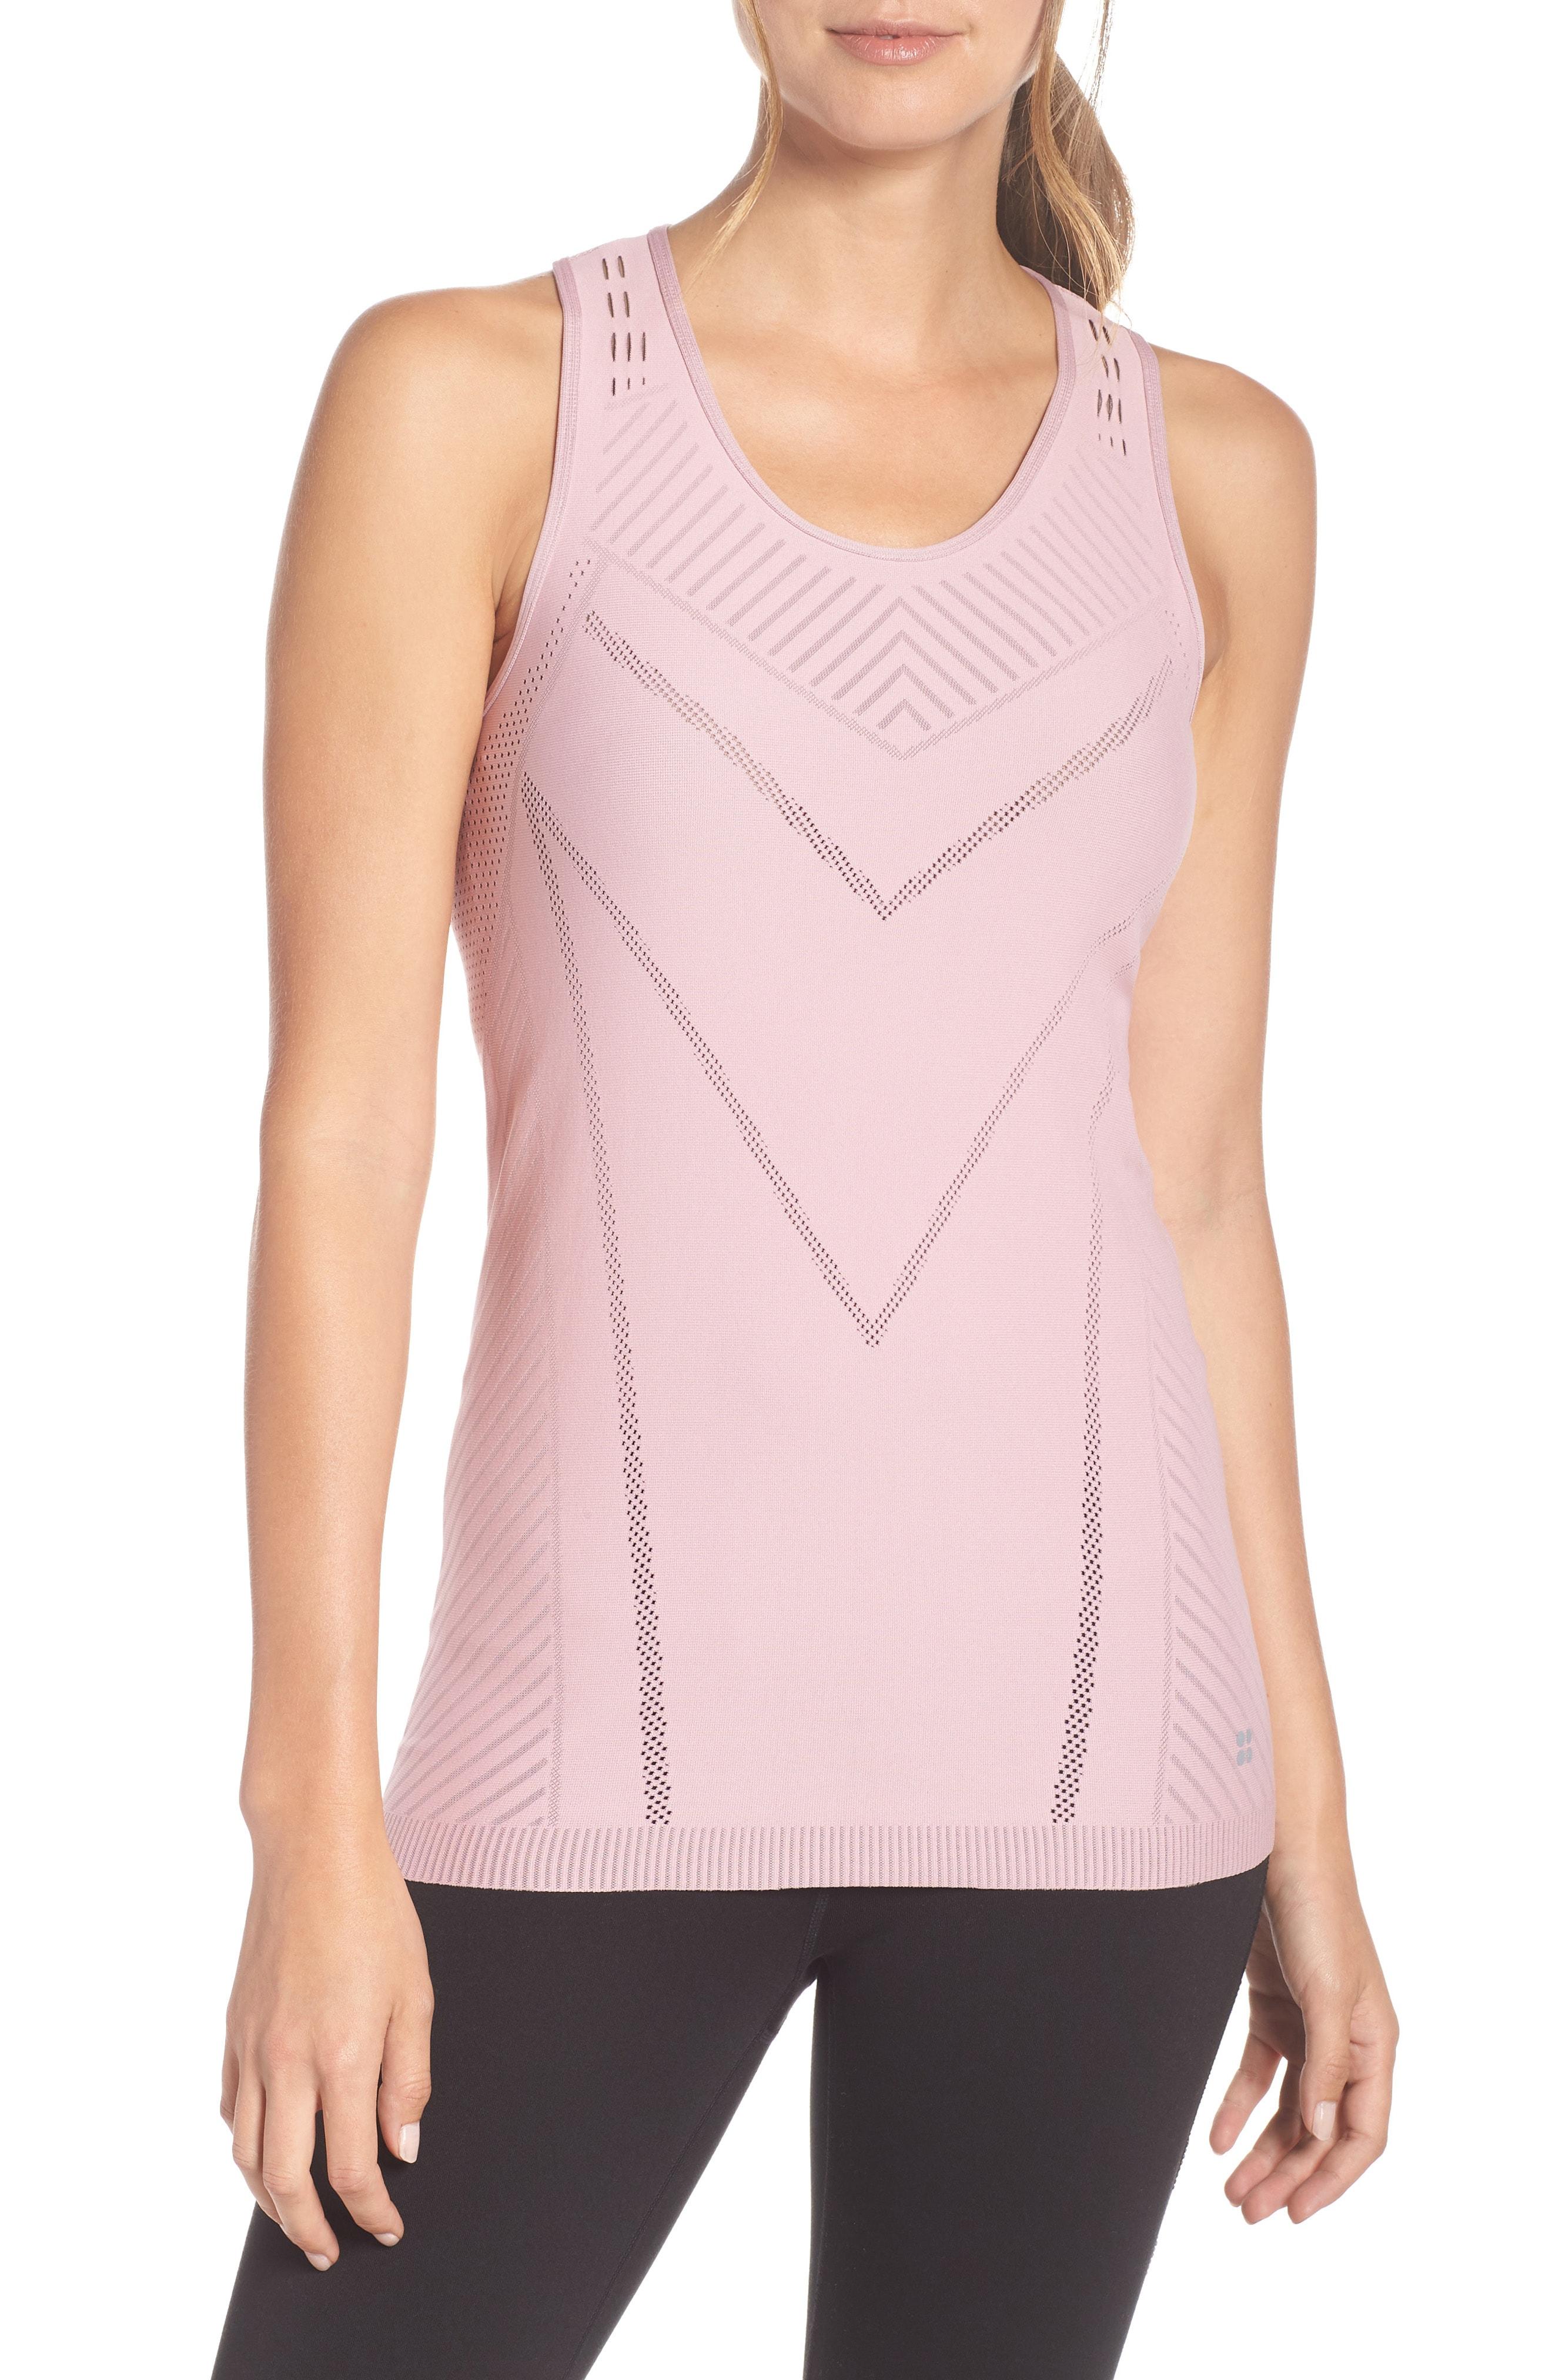 Sweaty Betty Luxe Yoga Vest